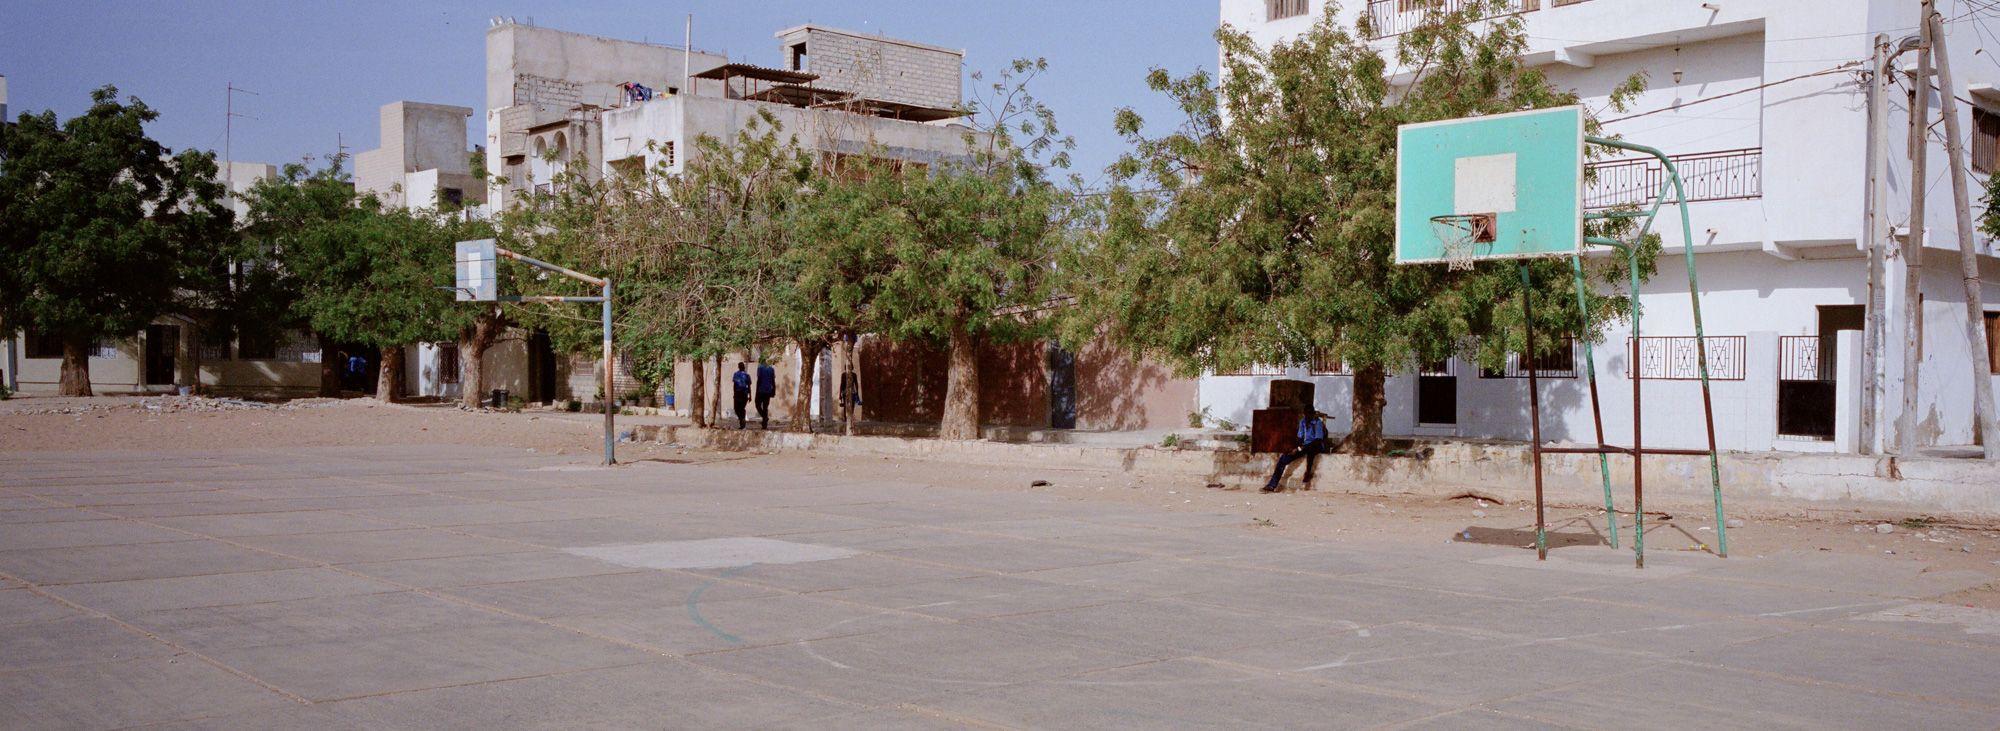 Mermoz — Dakar, Senegal shot with an Hasselblad Xpan II